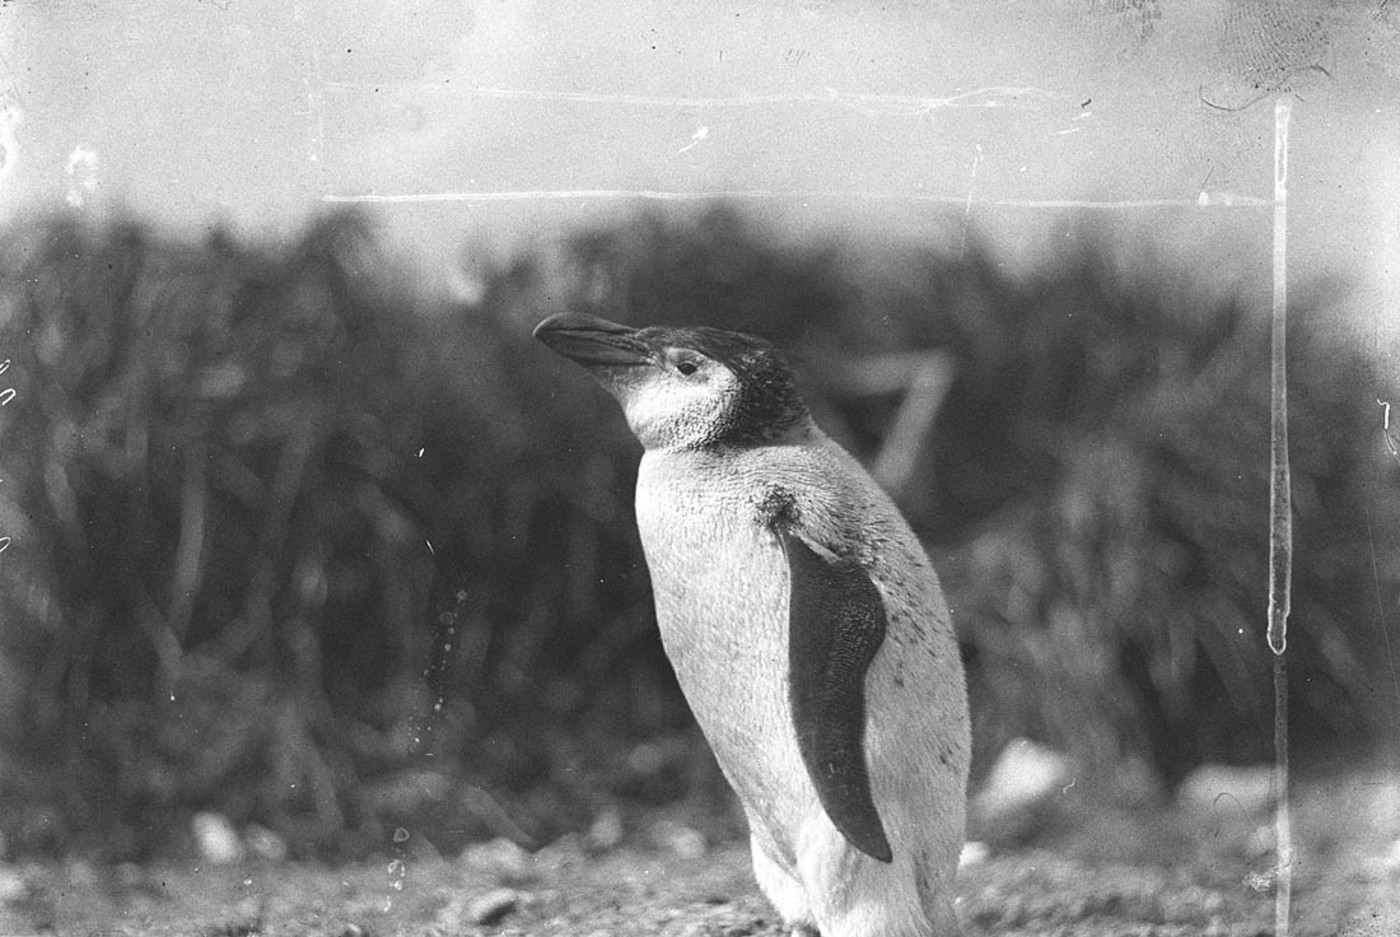 An Adelie Royal penguin, Australasian Antarctic Expedition, 1911-14 / photographer Harold Hamilton